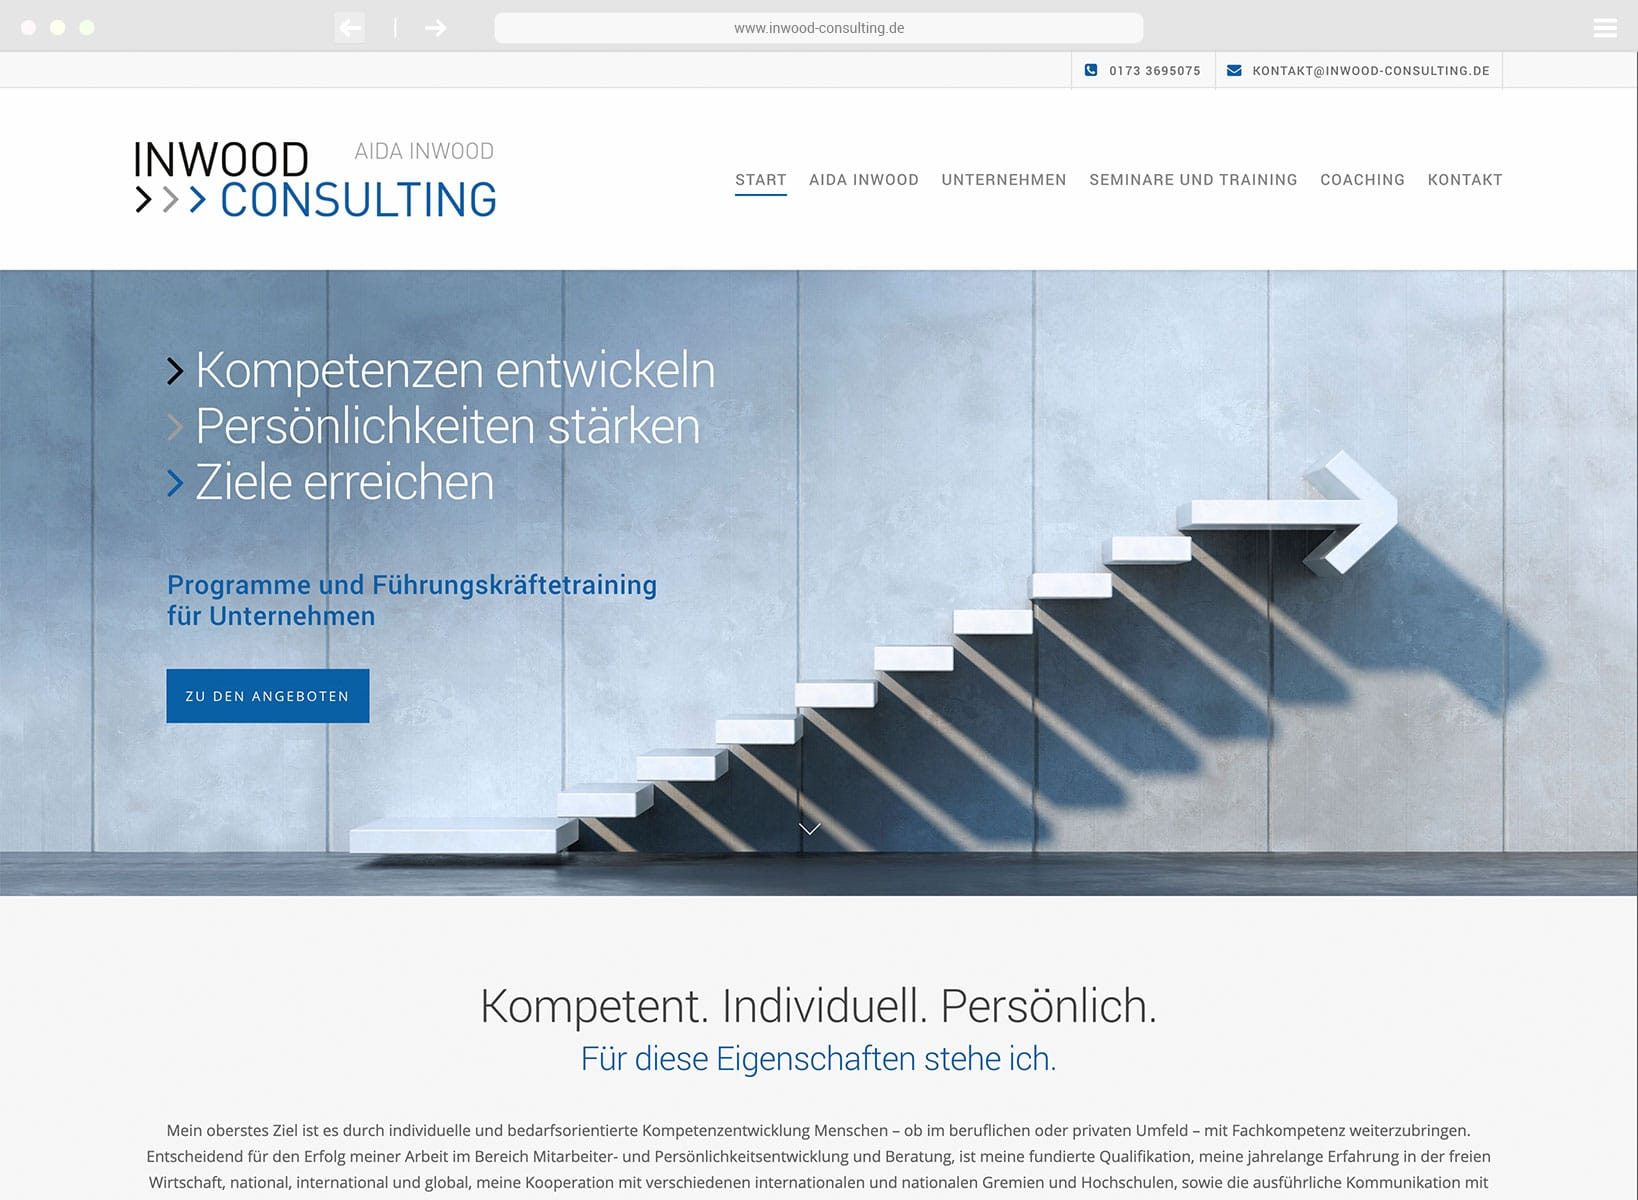 www.inwood-consulting.de